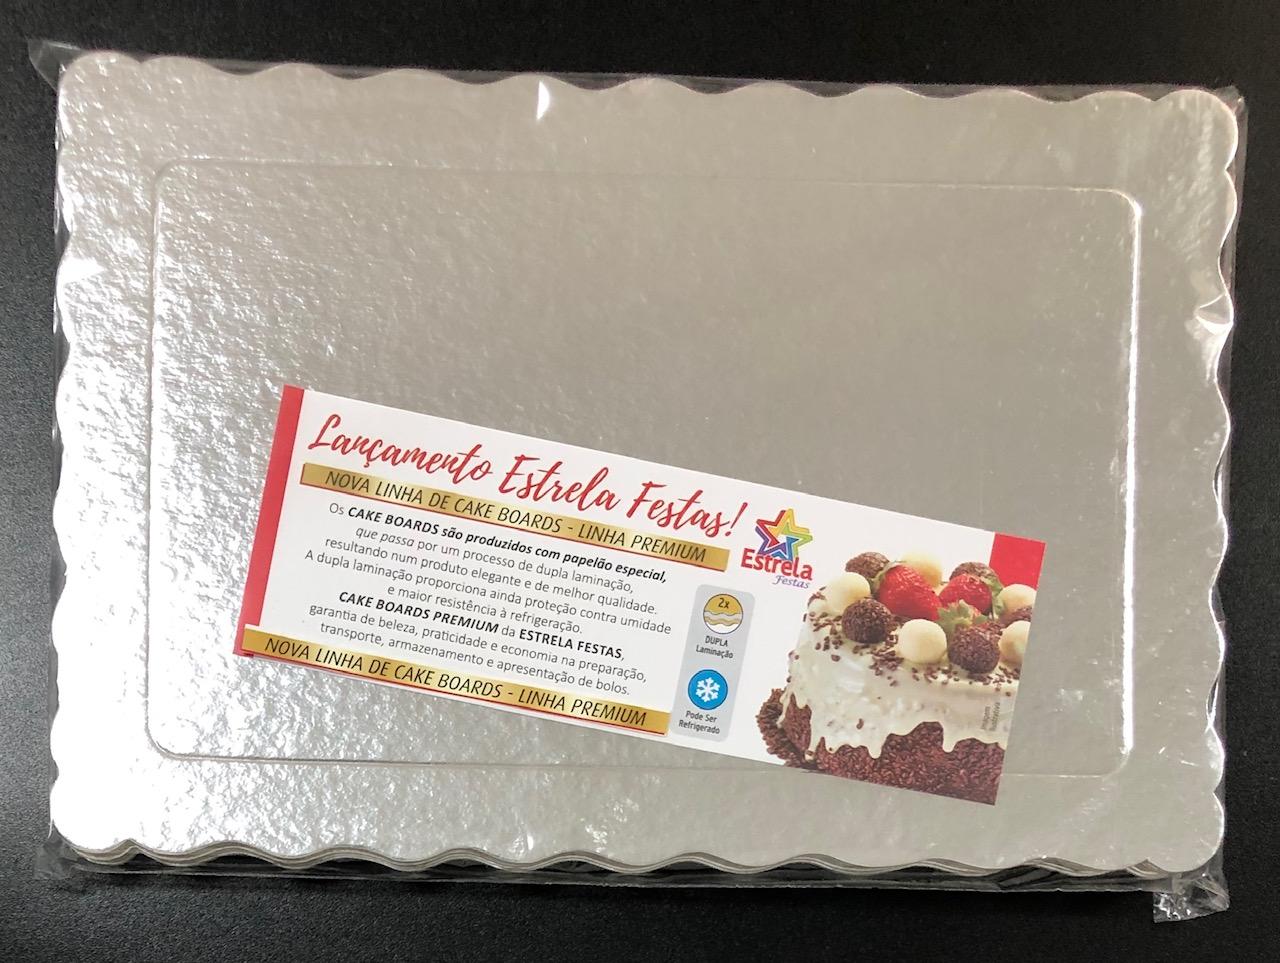 100 Bases Laminadas, Suporte P/ Bolo, Cake Board, 30x20cm - Prata